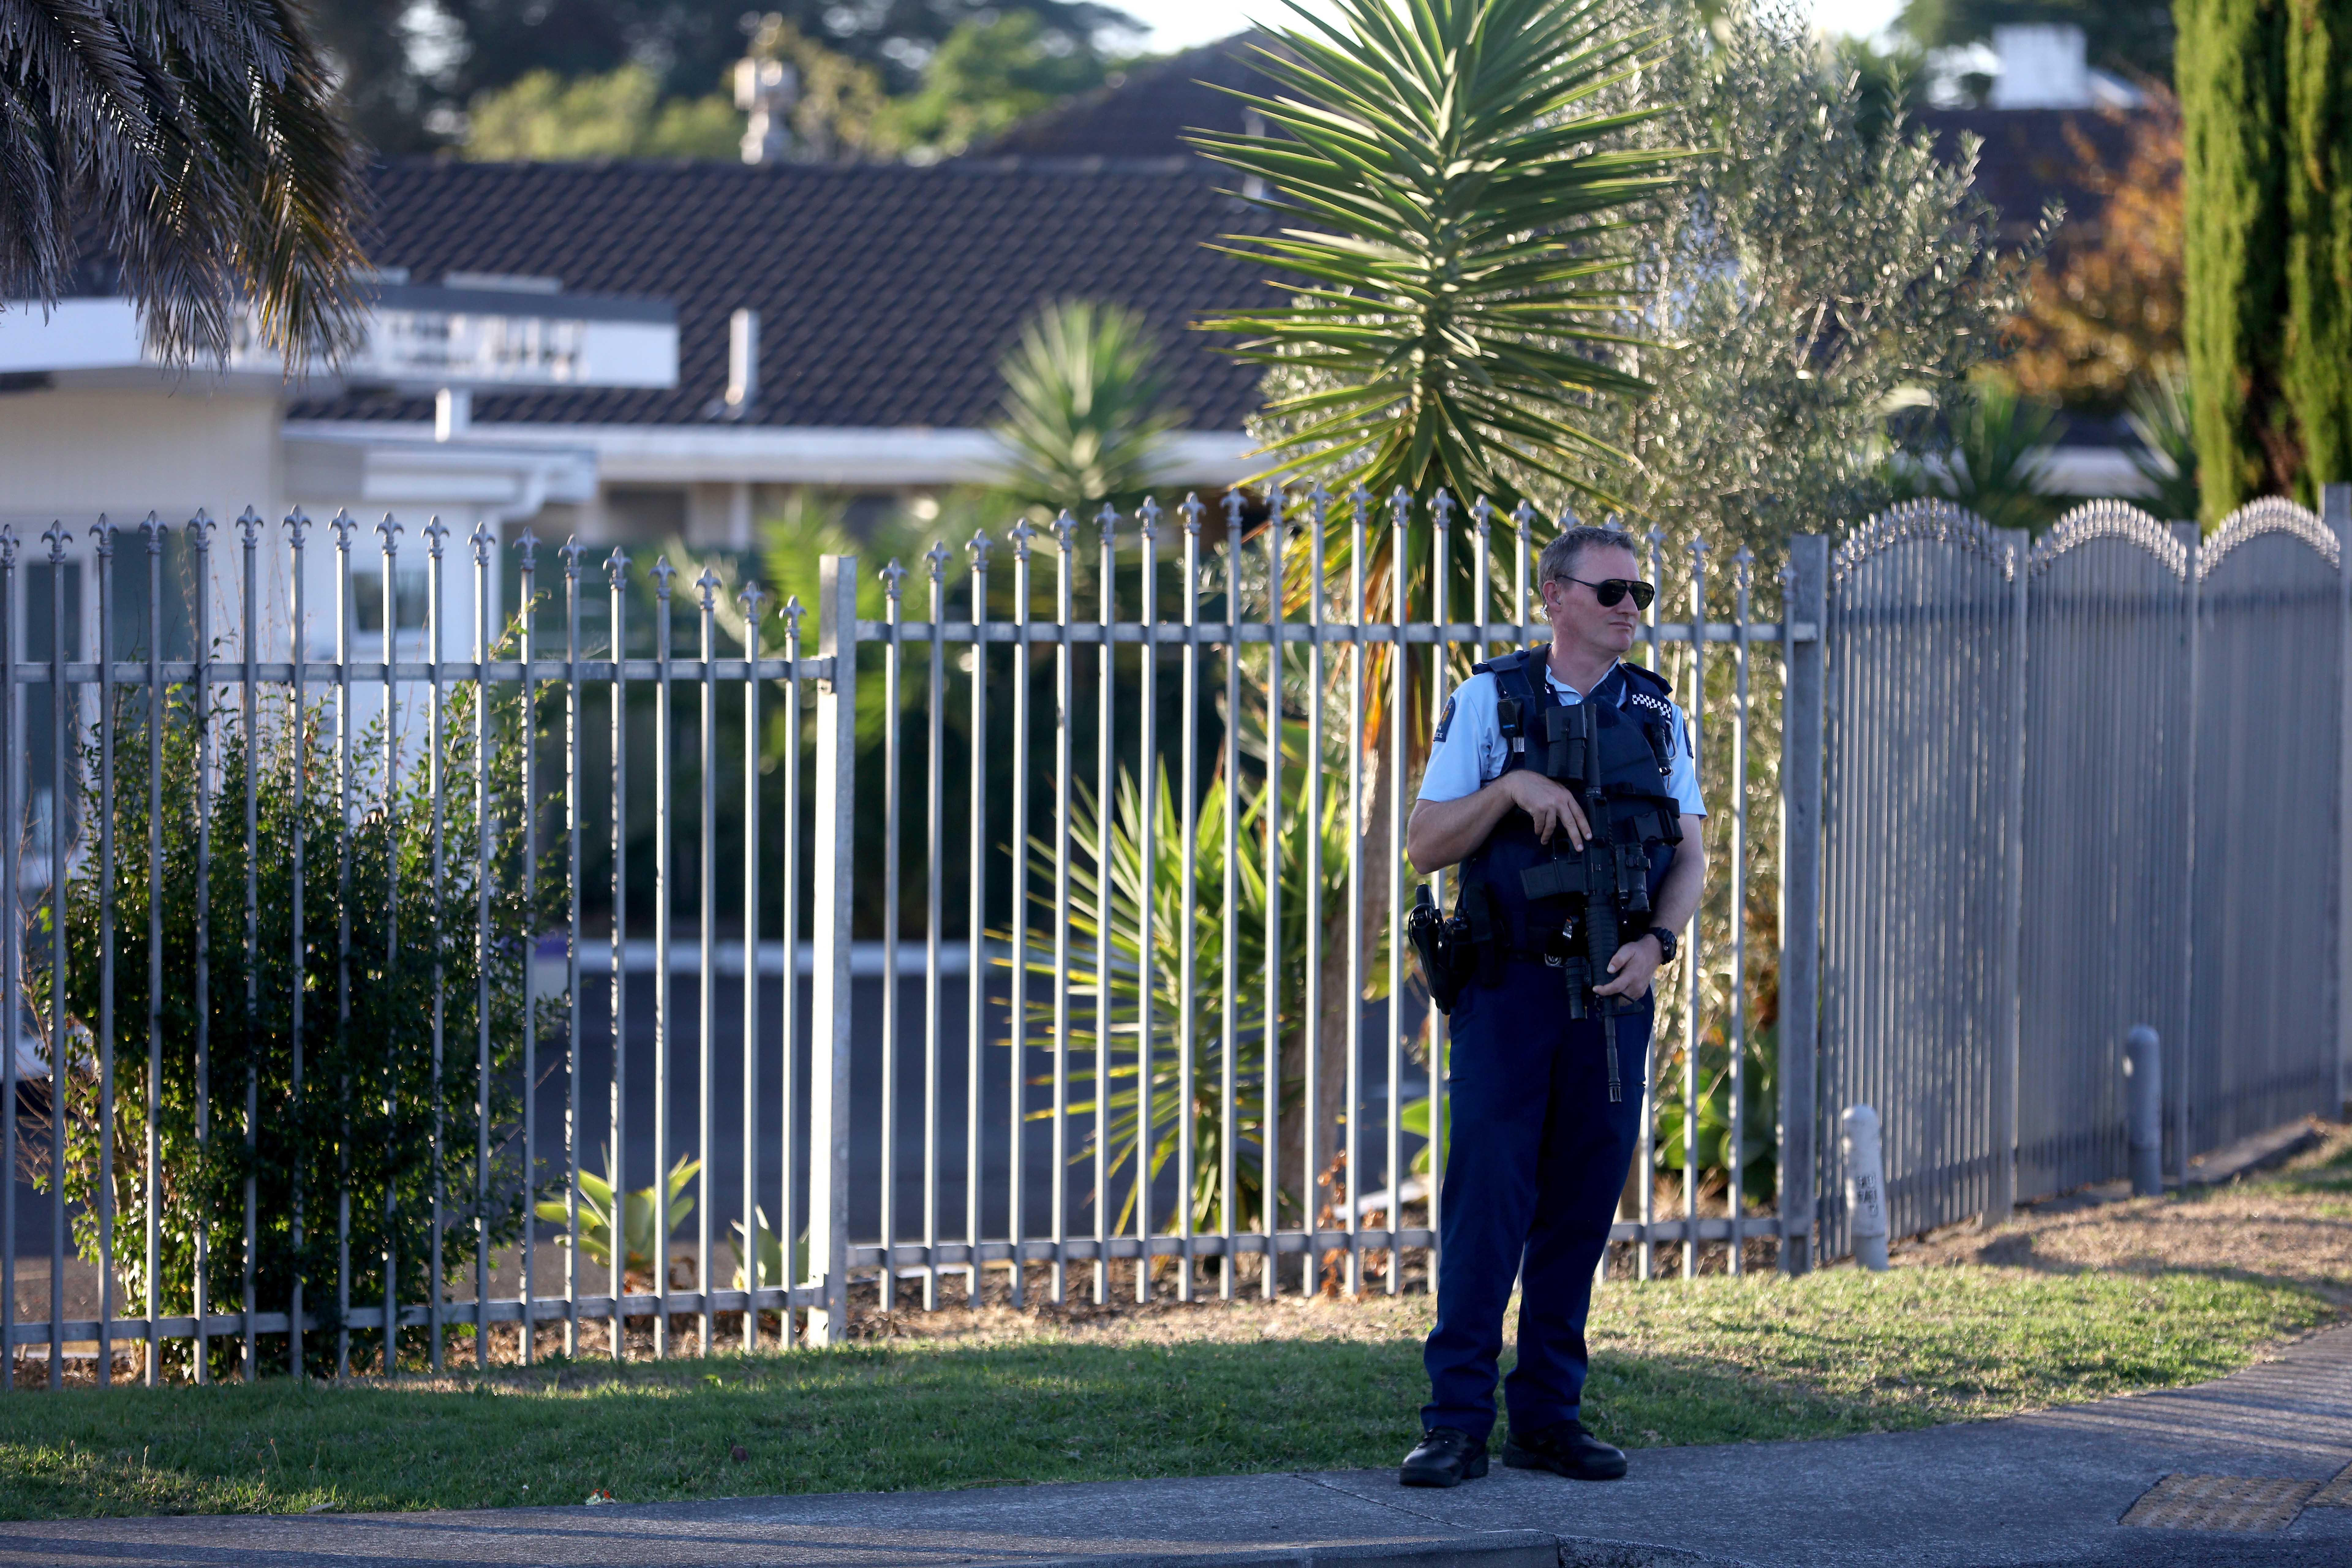 Testemunha viu menina de 3 ou 4 anos a ser baleada numa das mesquitas